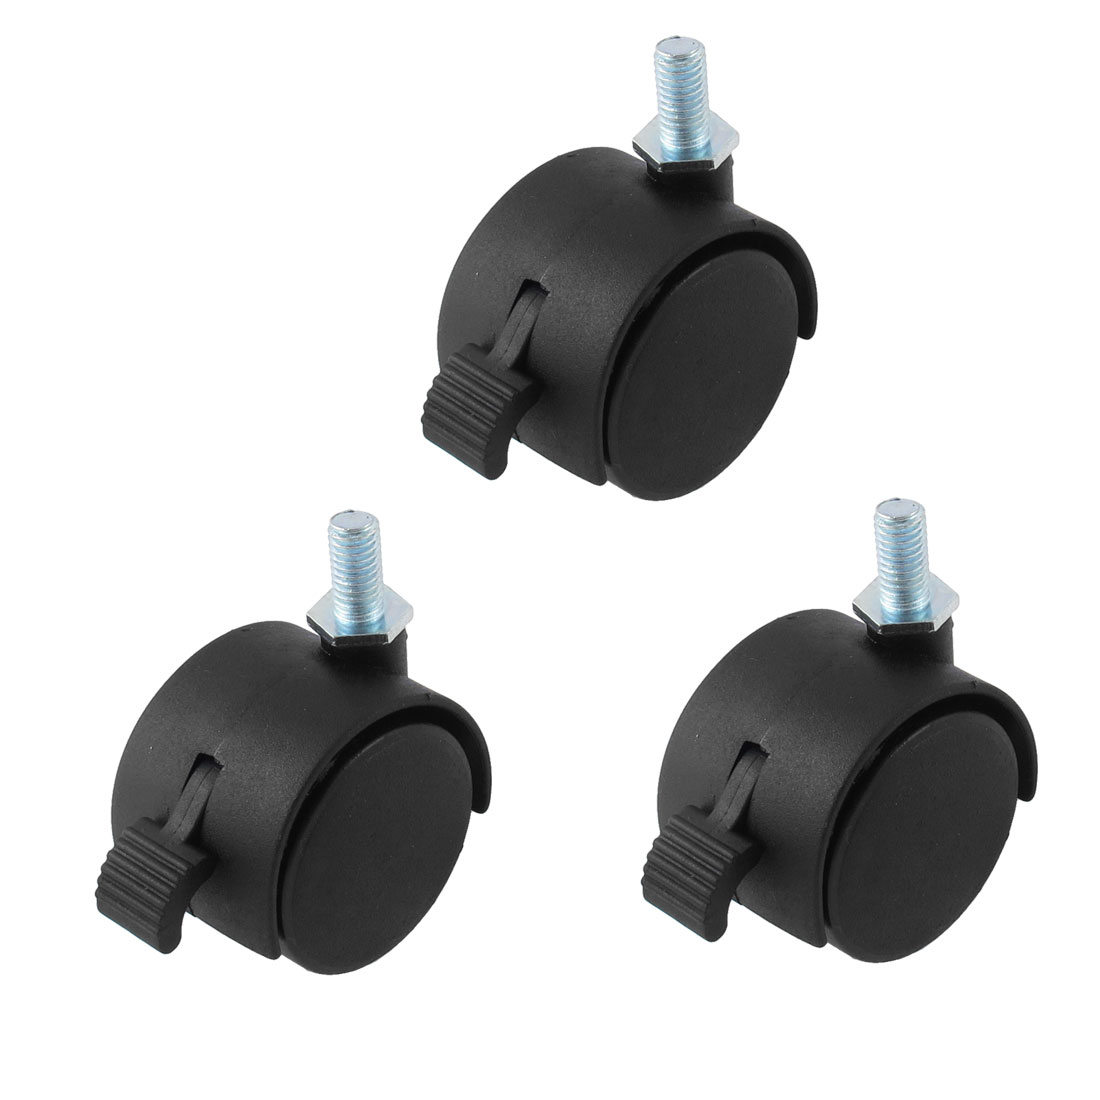 "Black Nylon 1.5"" Twin Wheel 5/16"" x 5/8"" Threaded Stem Brake Swivel Casters 3pcs"